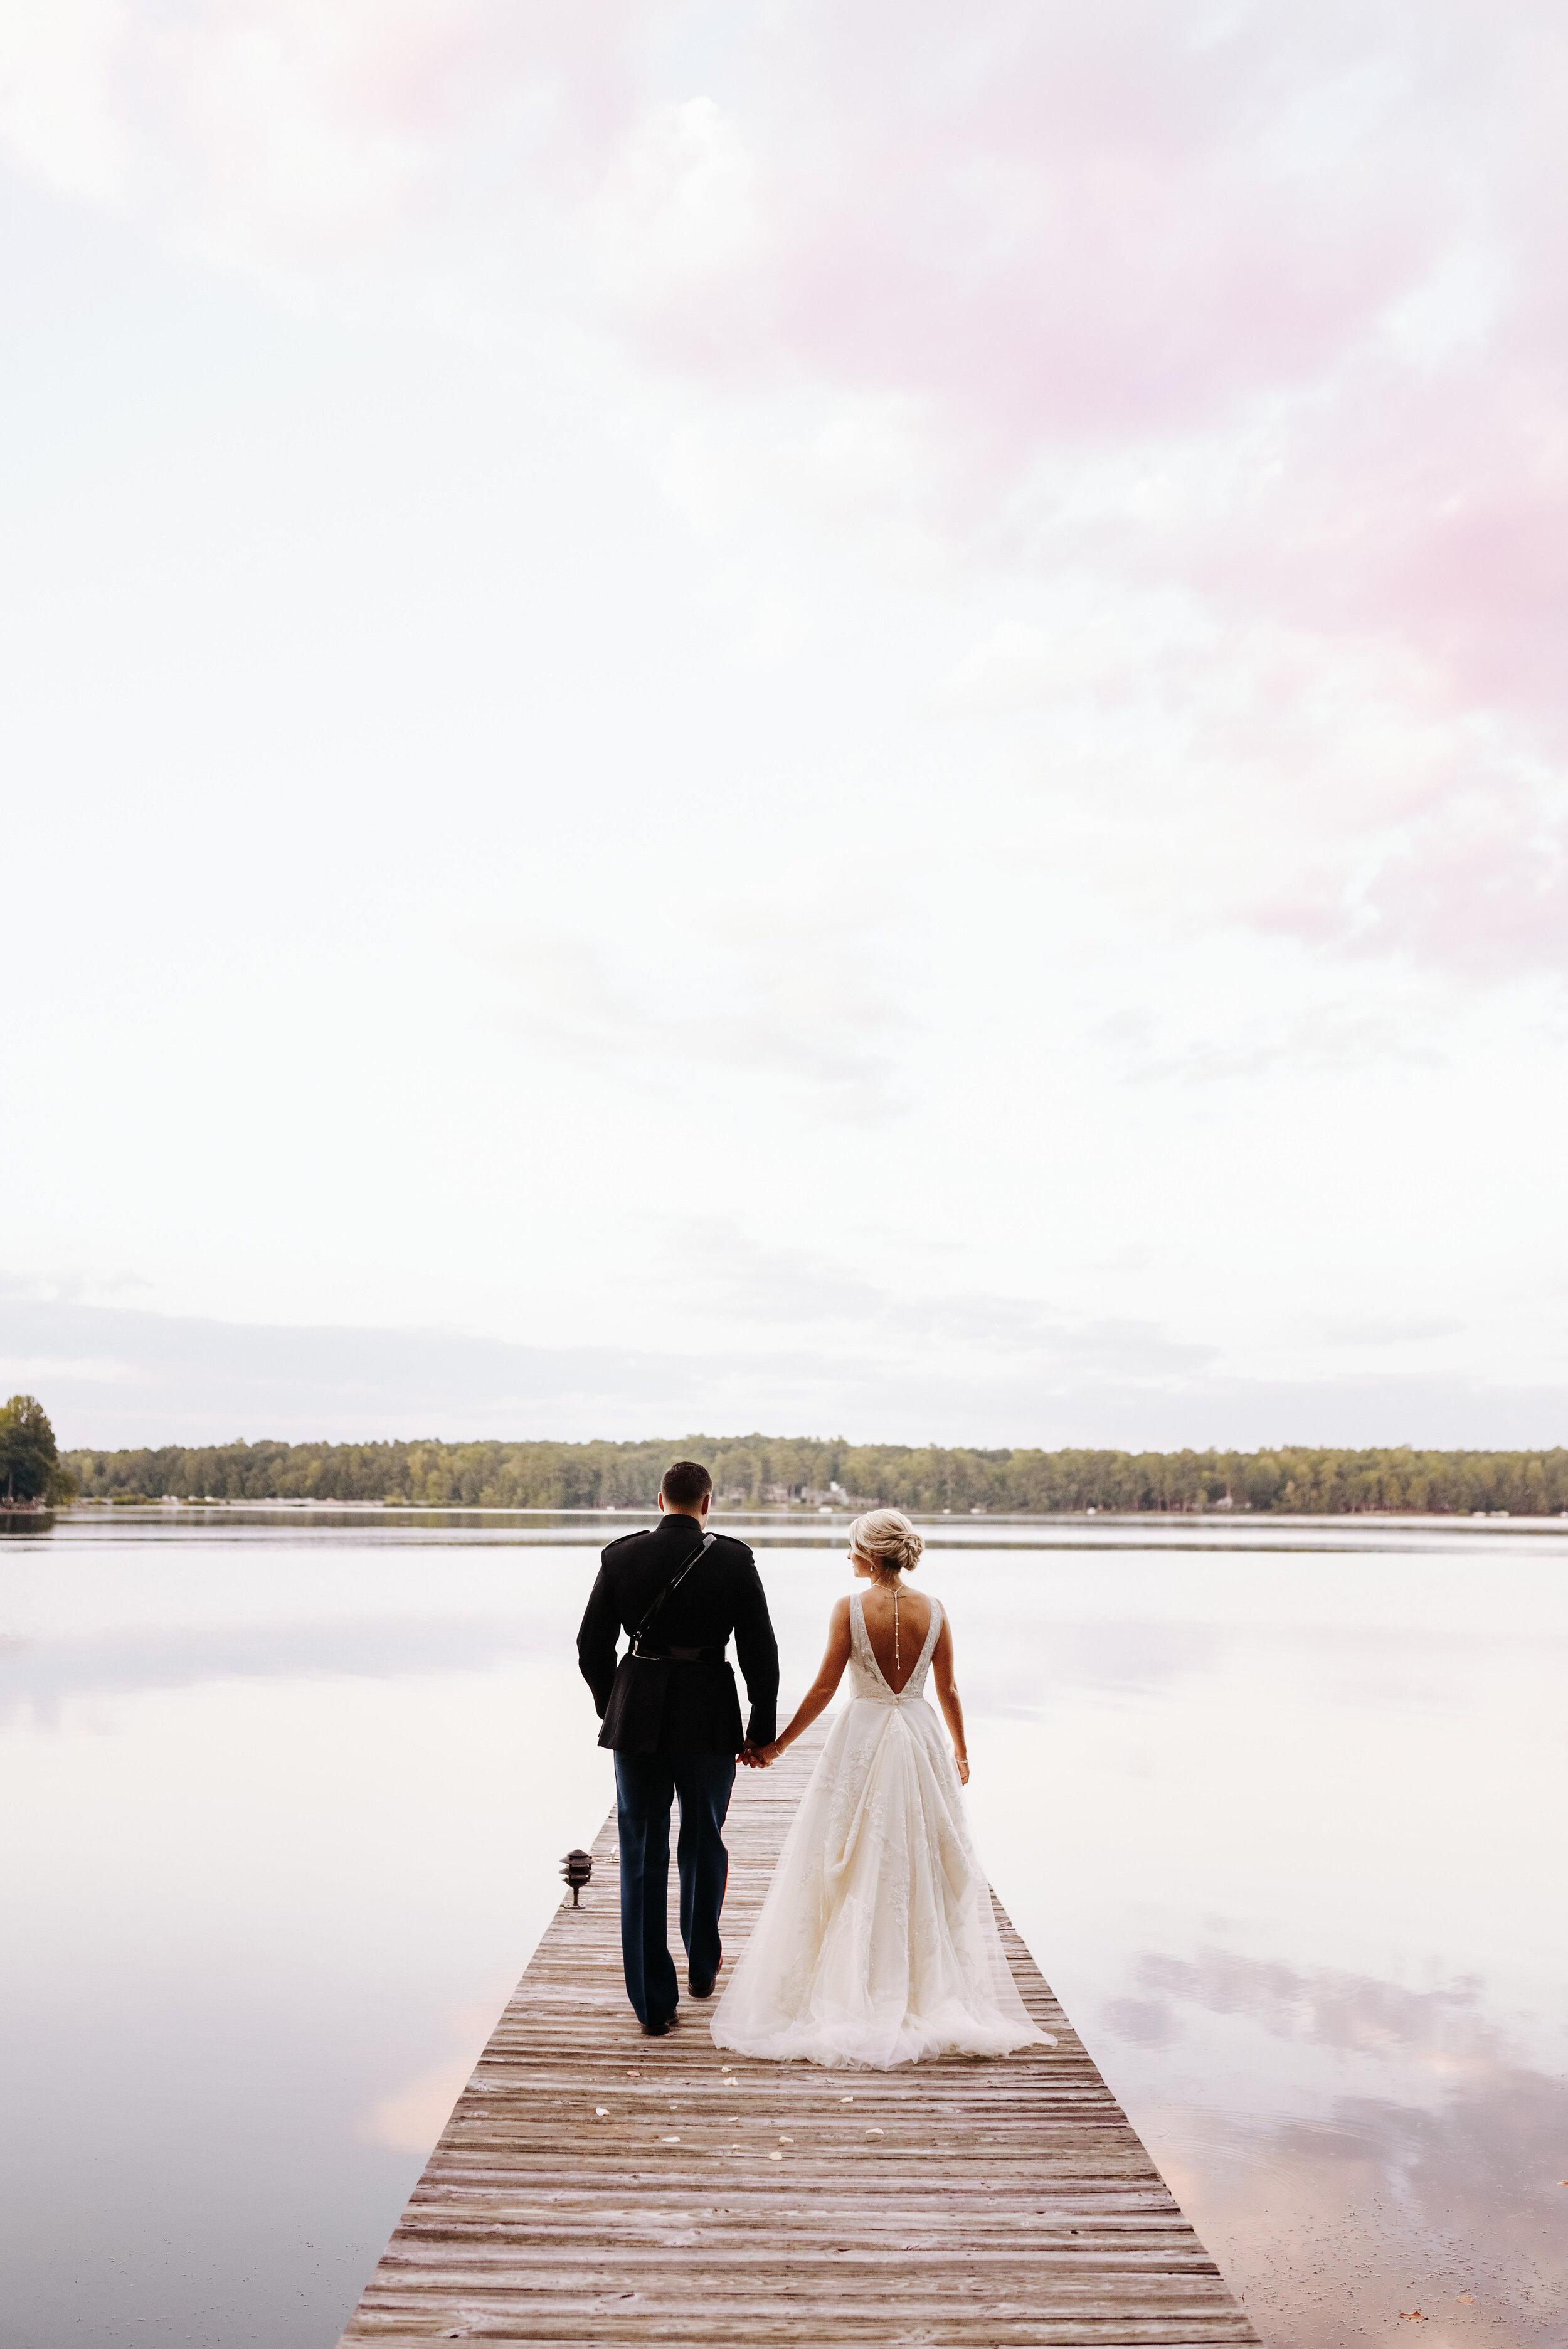 Emily_Mike_Wedding_Celebrations_at_the_Reservoir_Pool_Pavilion_Richmond_Virginia_Wedding_Photographer_Photography_by_V_98.jpg